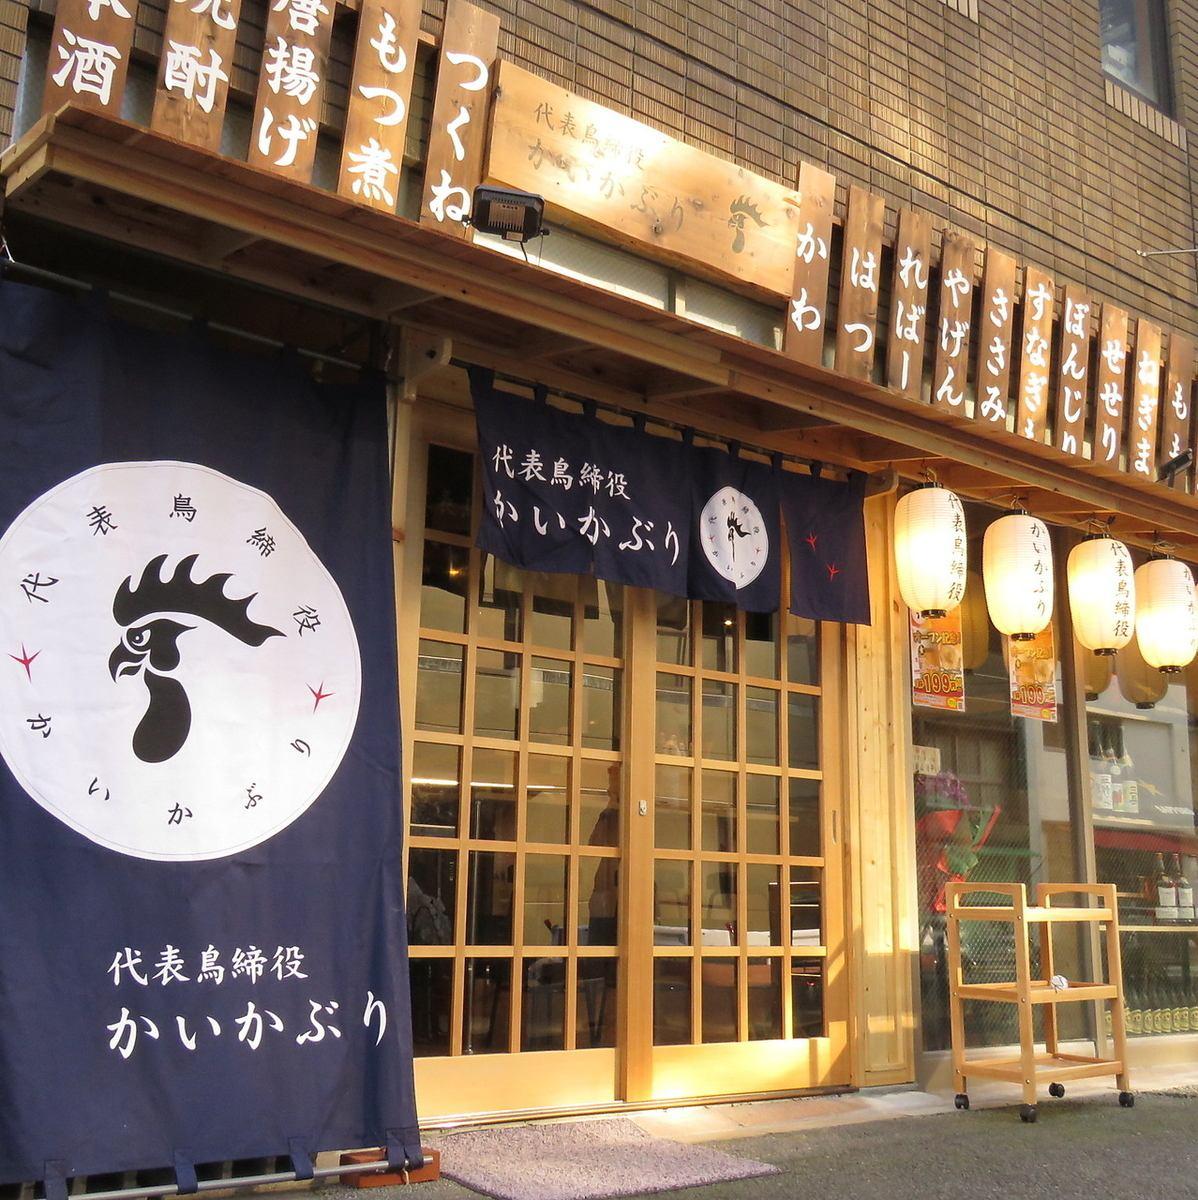 October 29 NEW OPEN! If you eat yakitori at Akihabara